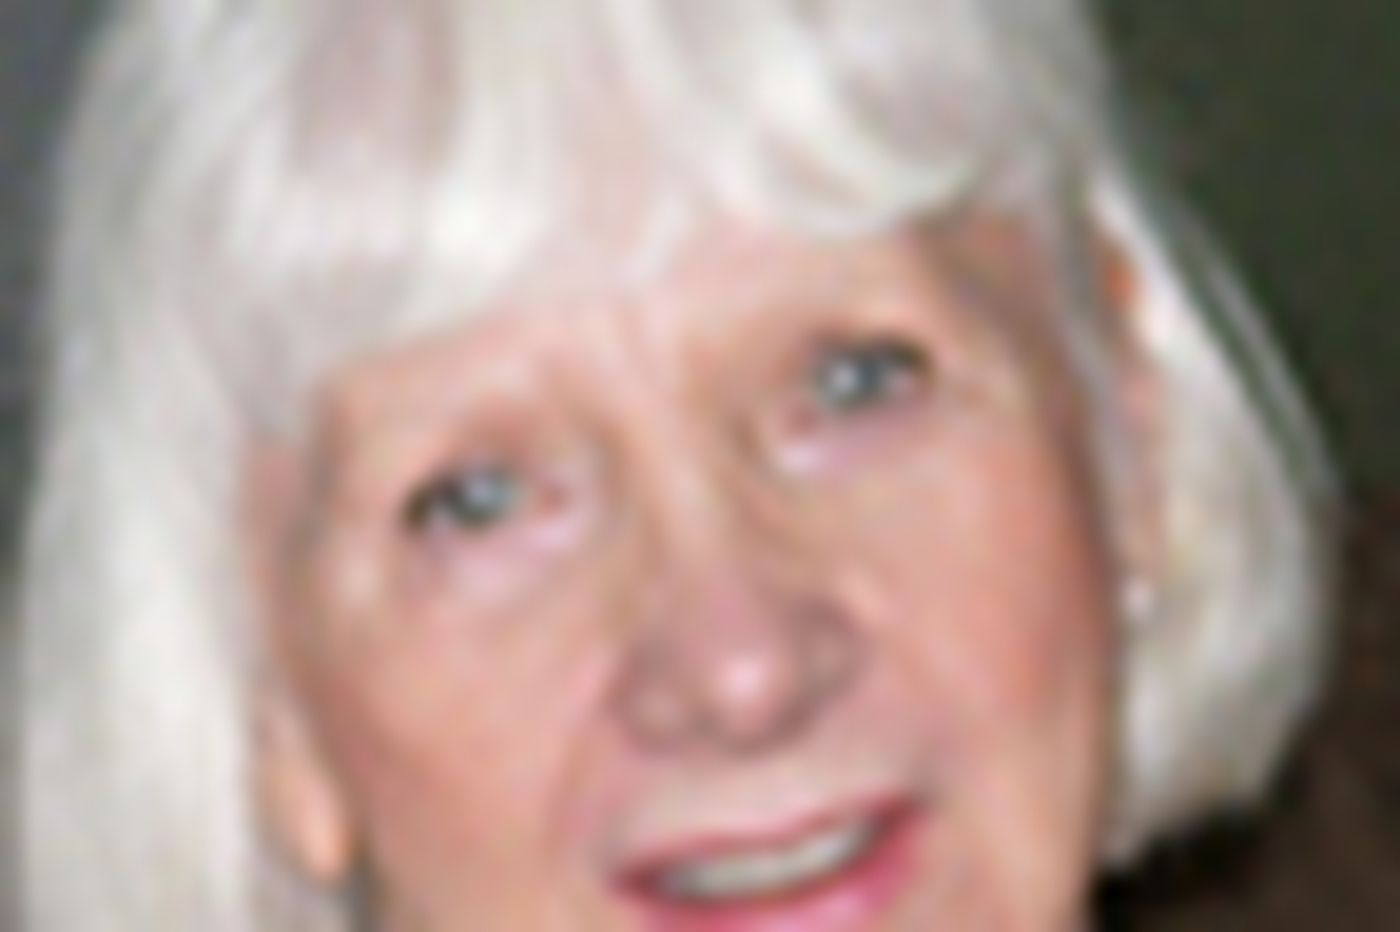 Hilda M. Abelson   Real estate agent, 81